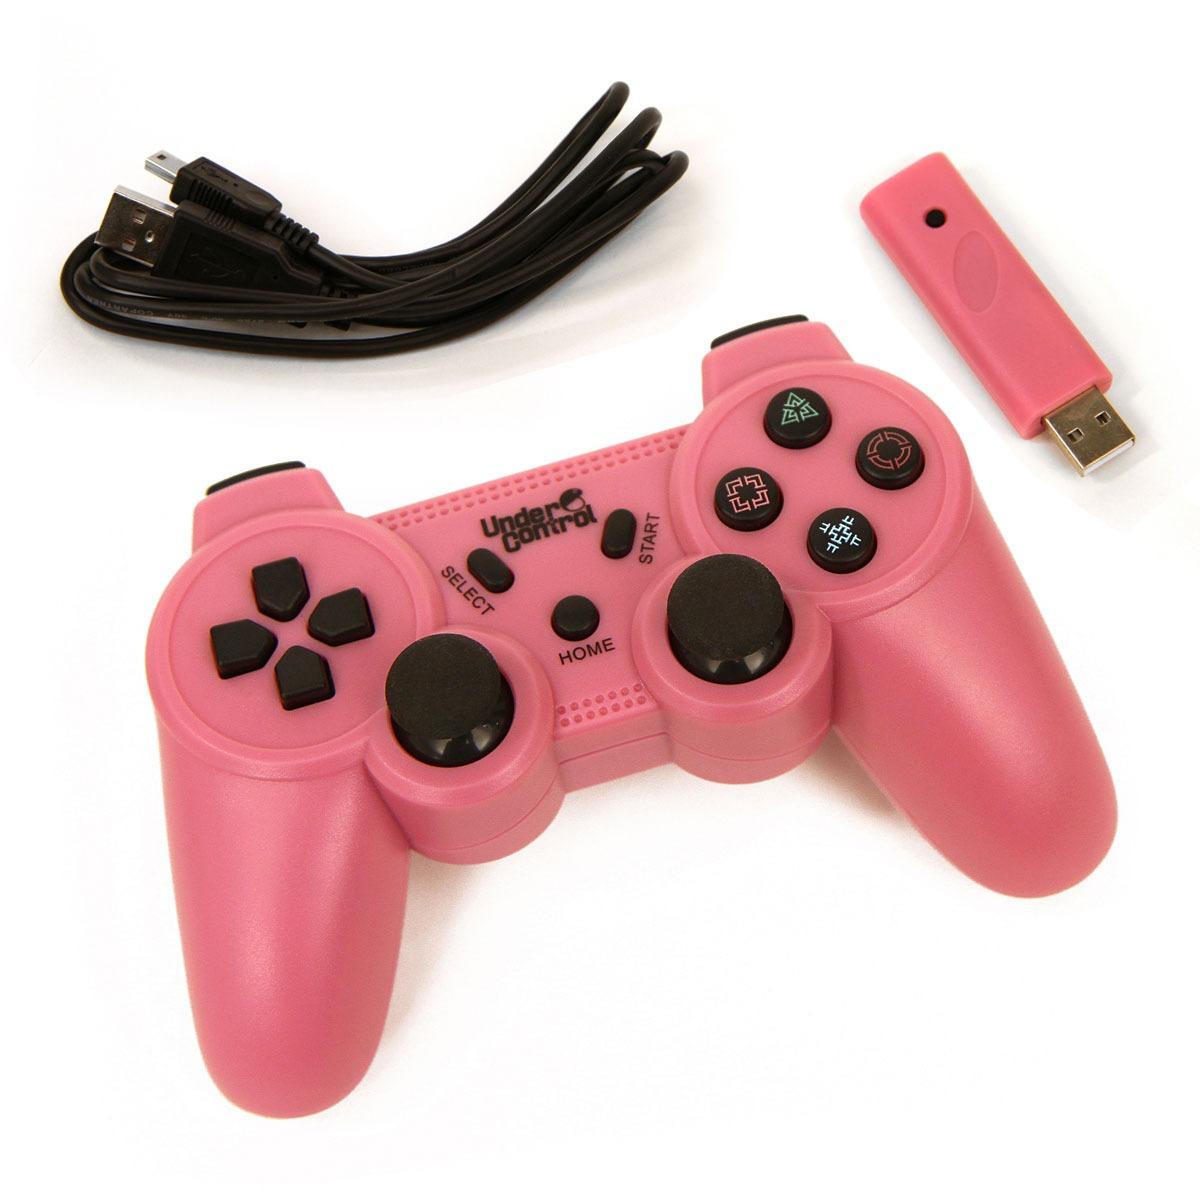 Accessoires PS3 Under Control Wireless Controller - rose (PS3) Under Control Manette sans fil - rose